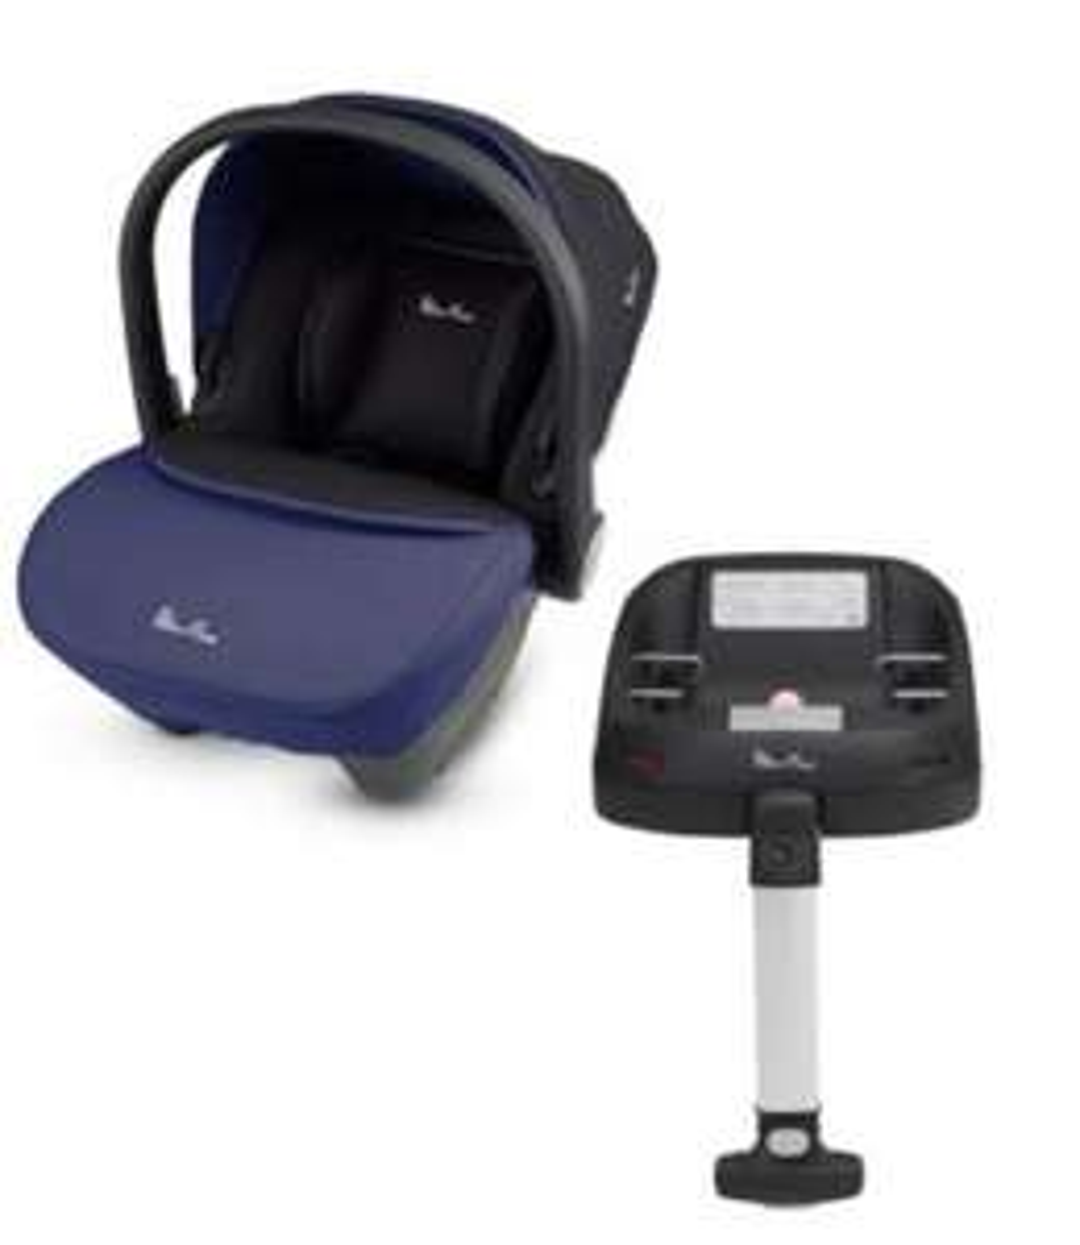 Silver Cross Simplicity car seat + Isofix base - £199.99 @ Lesters Nurseryworld